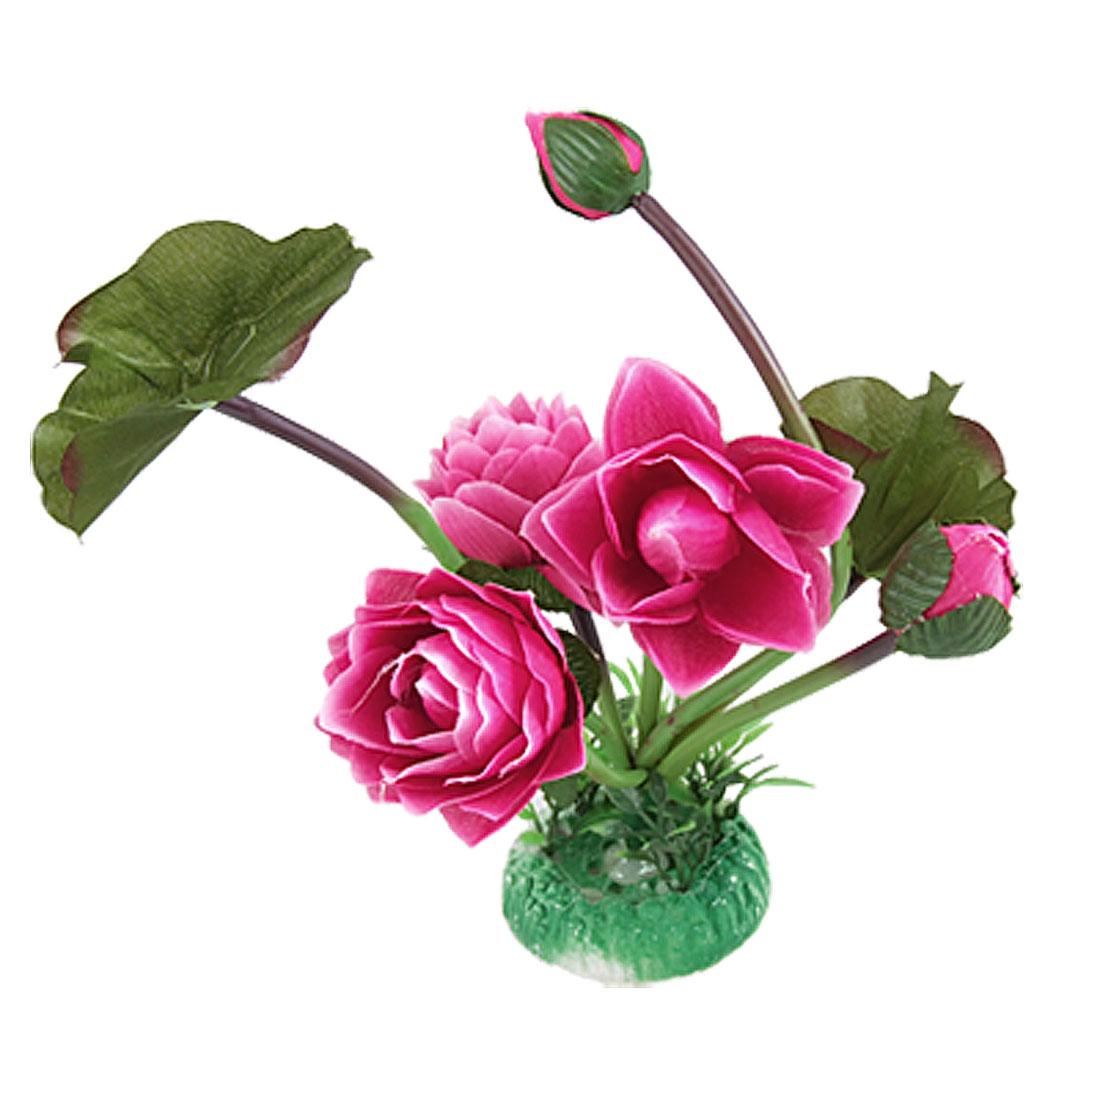 Hot Pink Lotus w Green Leaf Decor for Fish Tank Aquarium